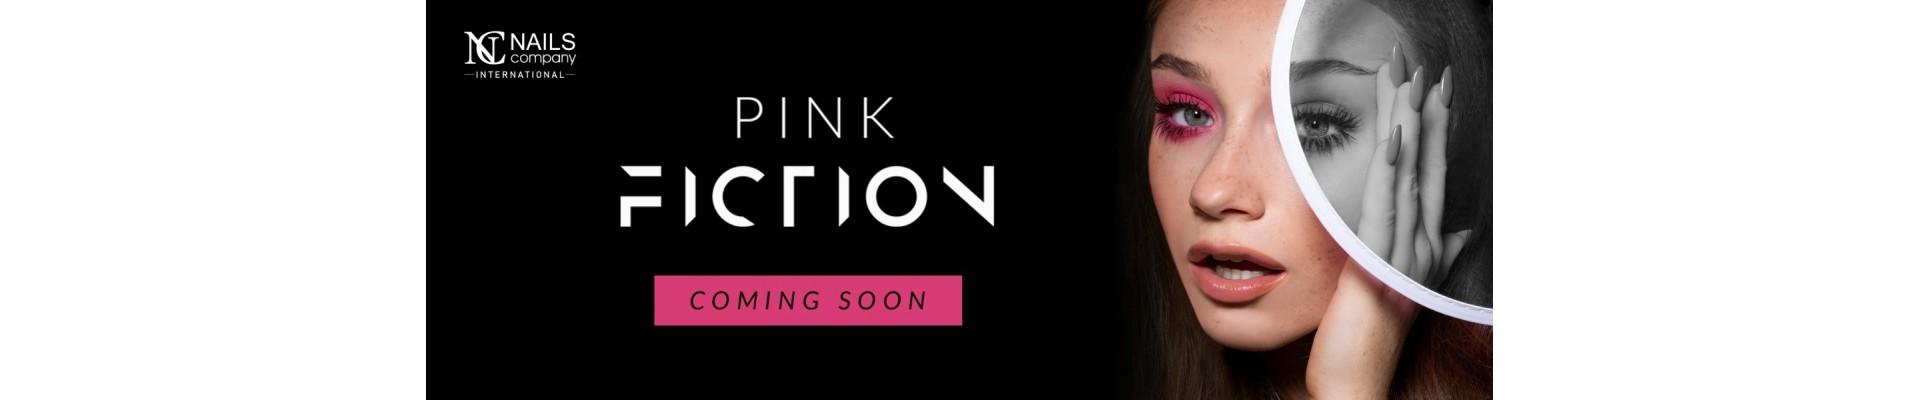 PINK FICTION